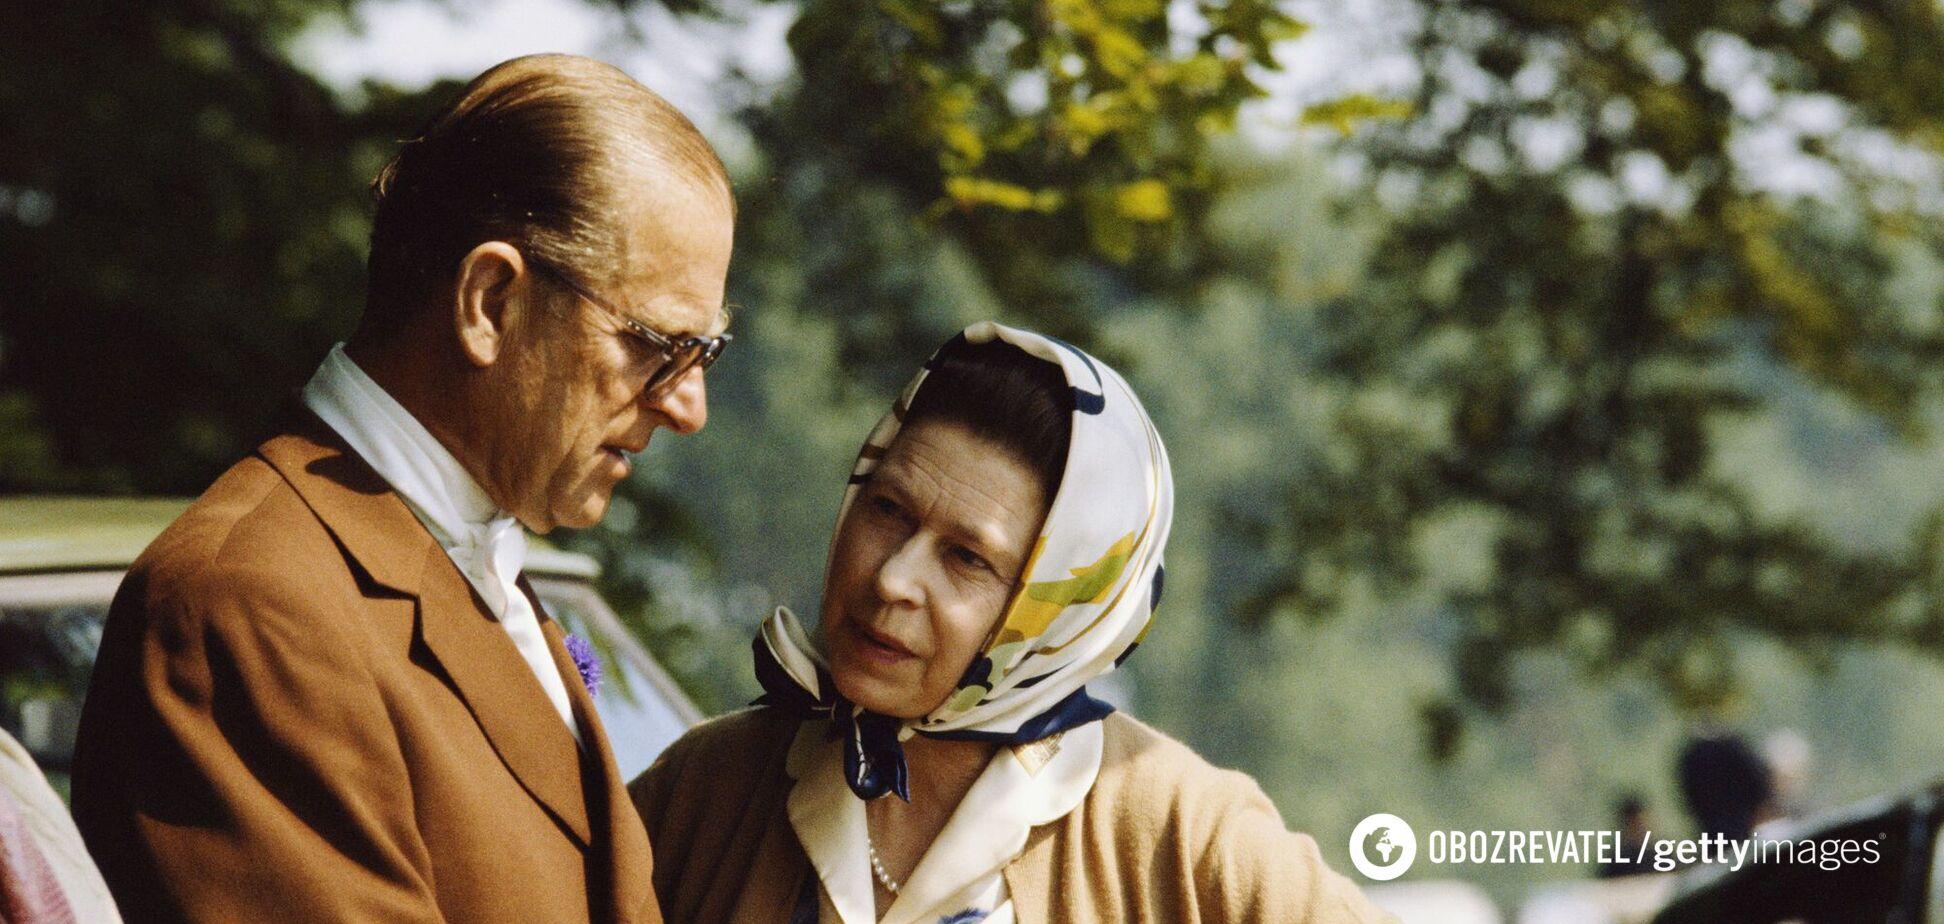 Елизавета II показала свое любимое фото с принцем Филиппом на их «счастливом месте»